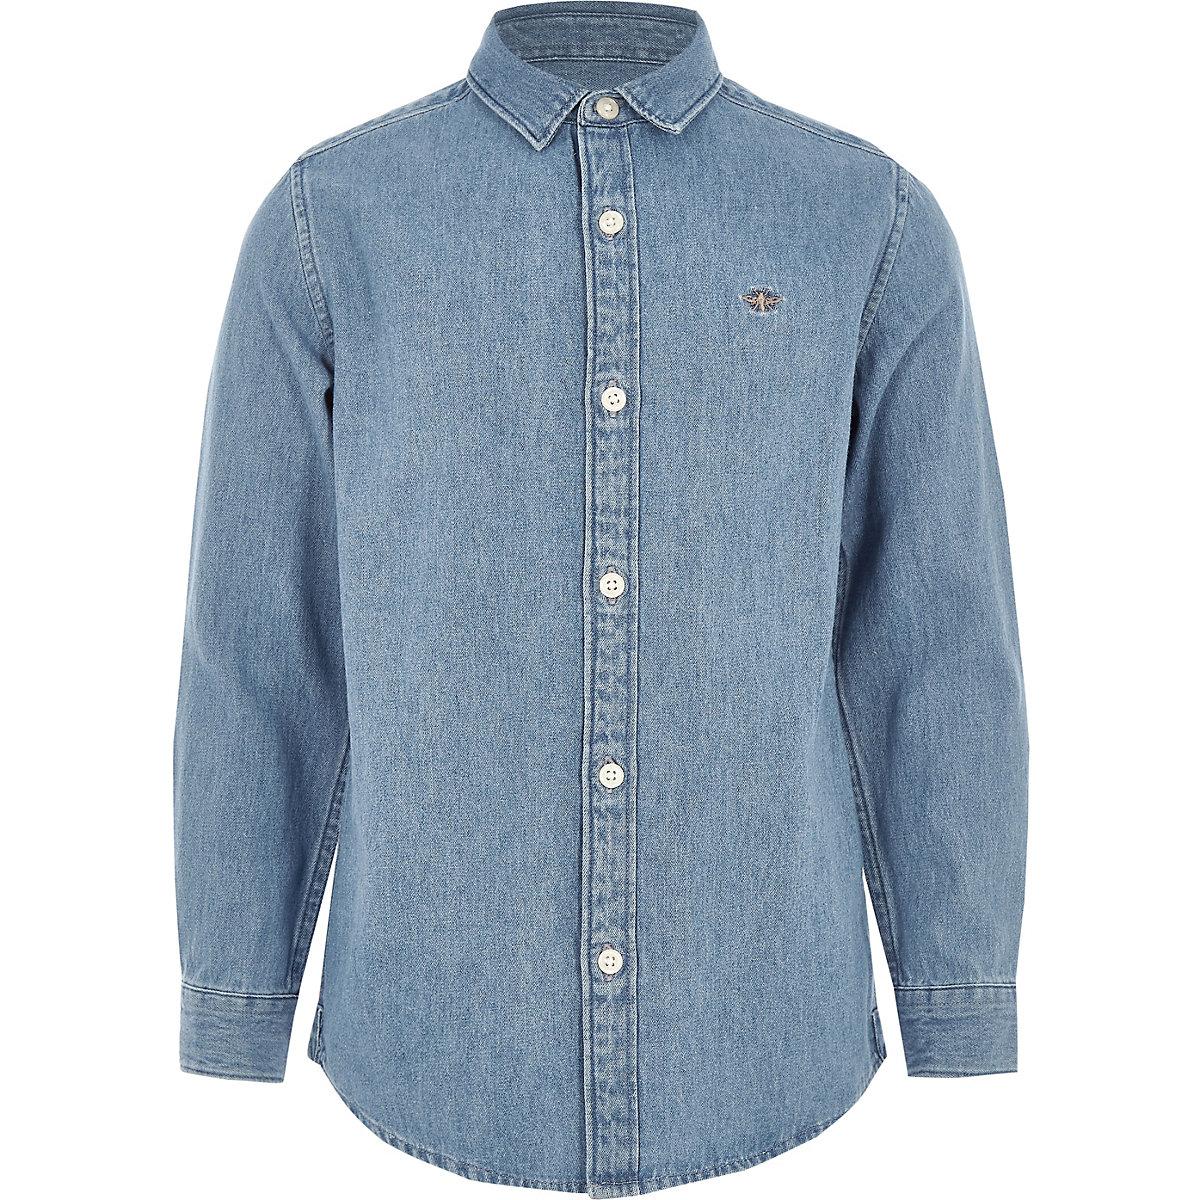 Boys mid blue wasp embroidered denim shirt